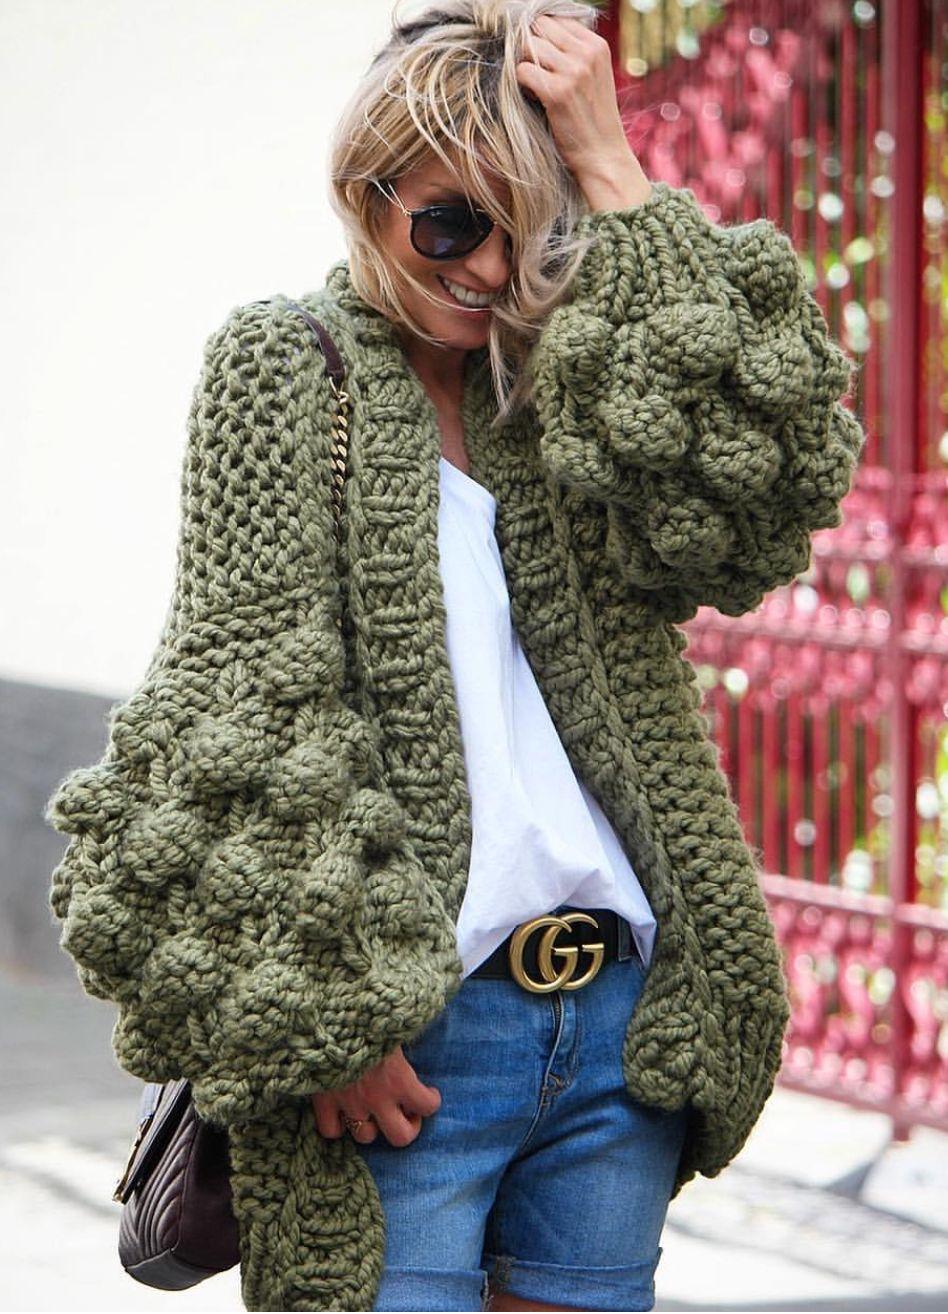 b67767eabb10 That sweater   I love autumn   Knitting, Sweaters, Knitwear